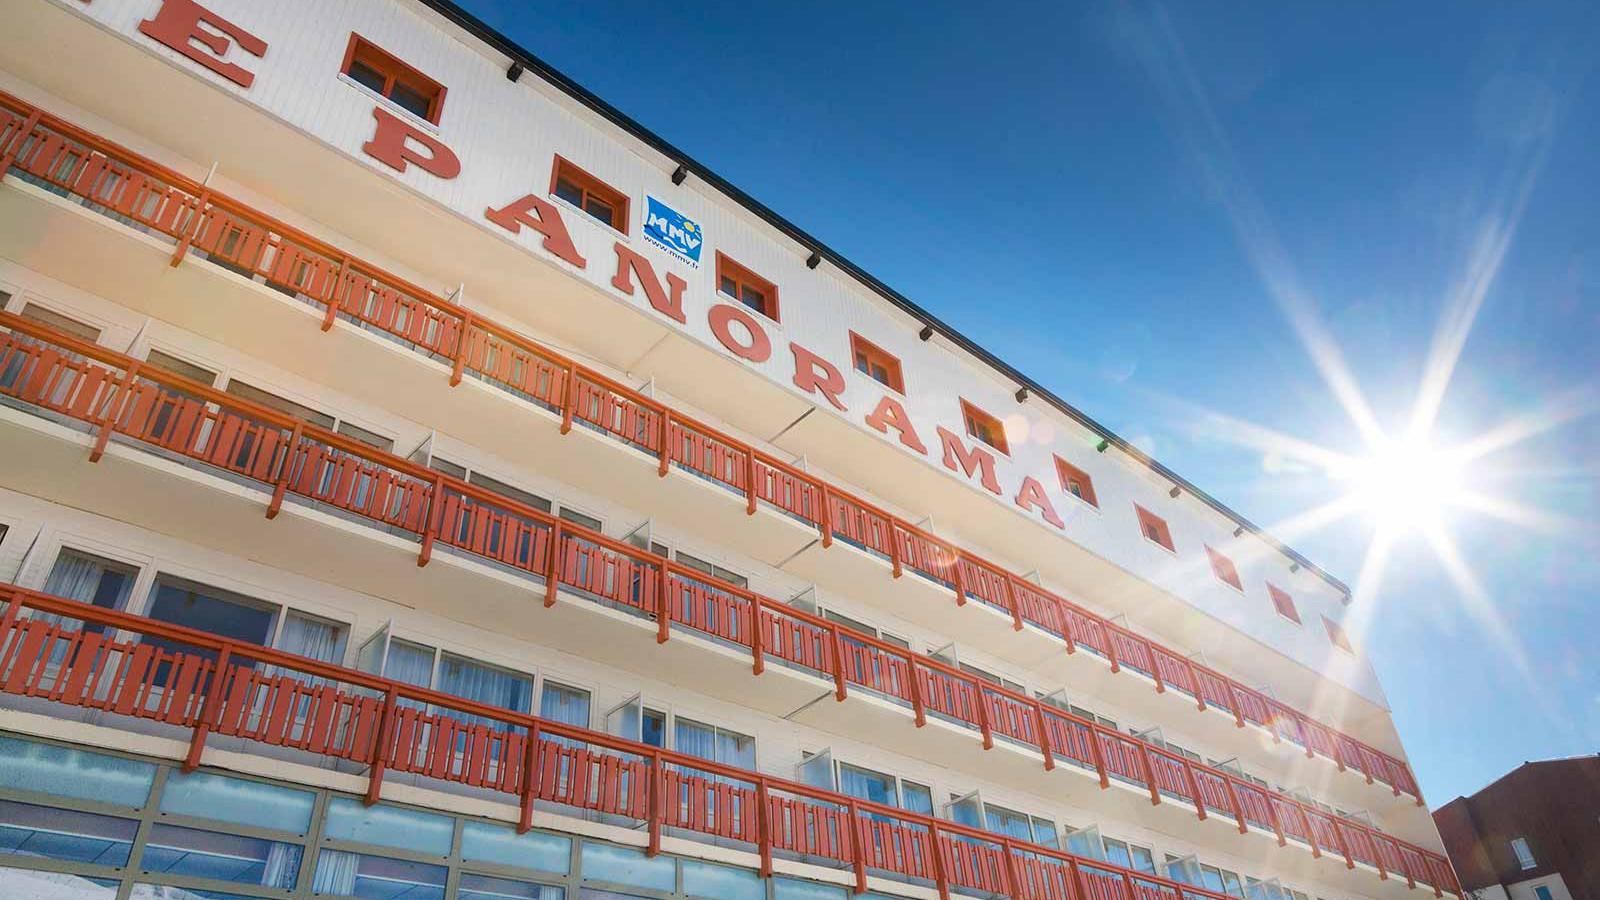 Hotel Club Les Panorama, Les Deux Alpes - Exterior